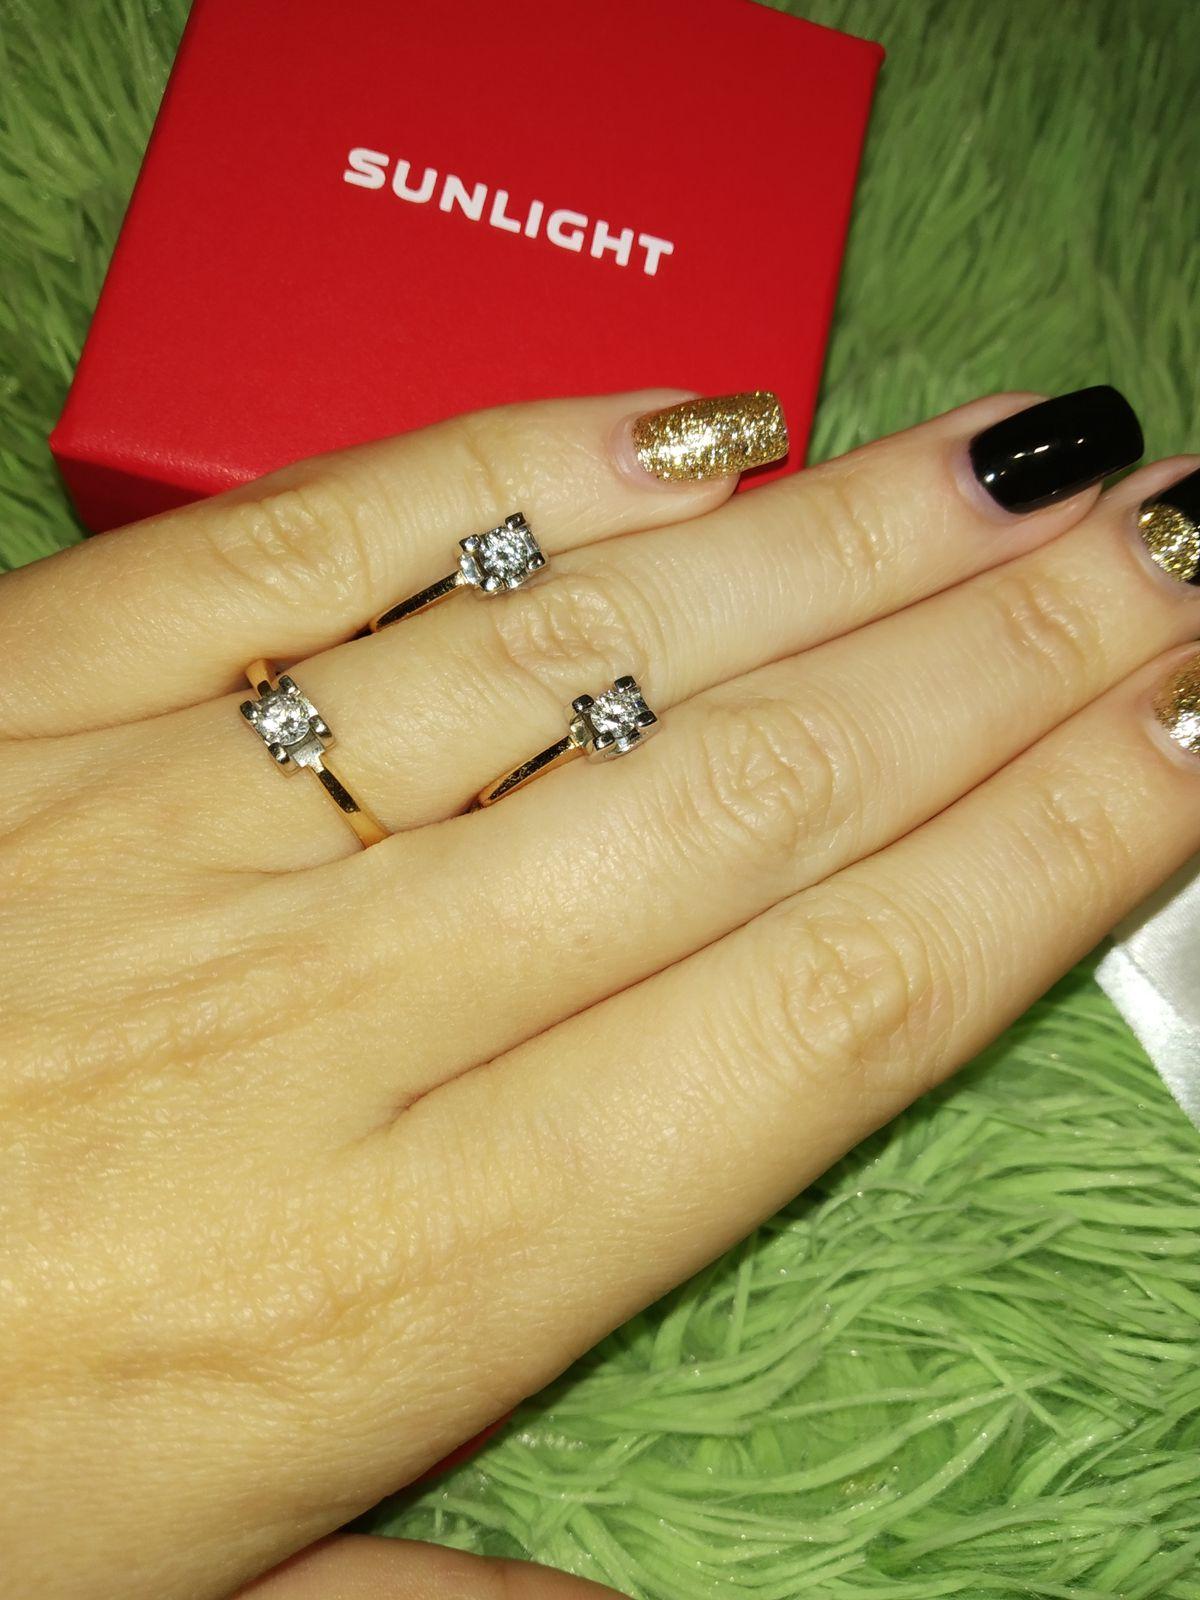 Женщины любят бриллианты.